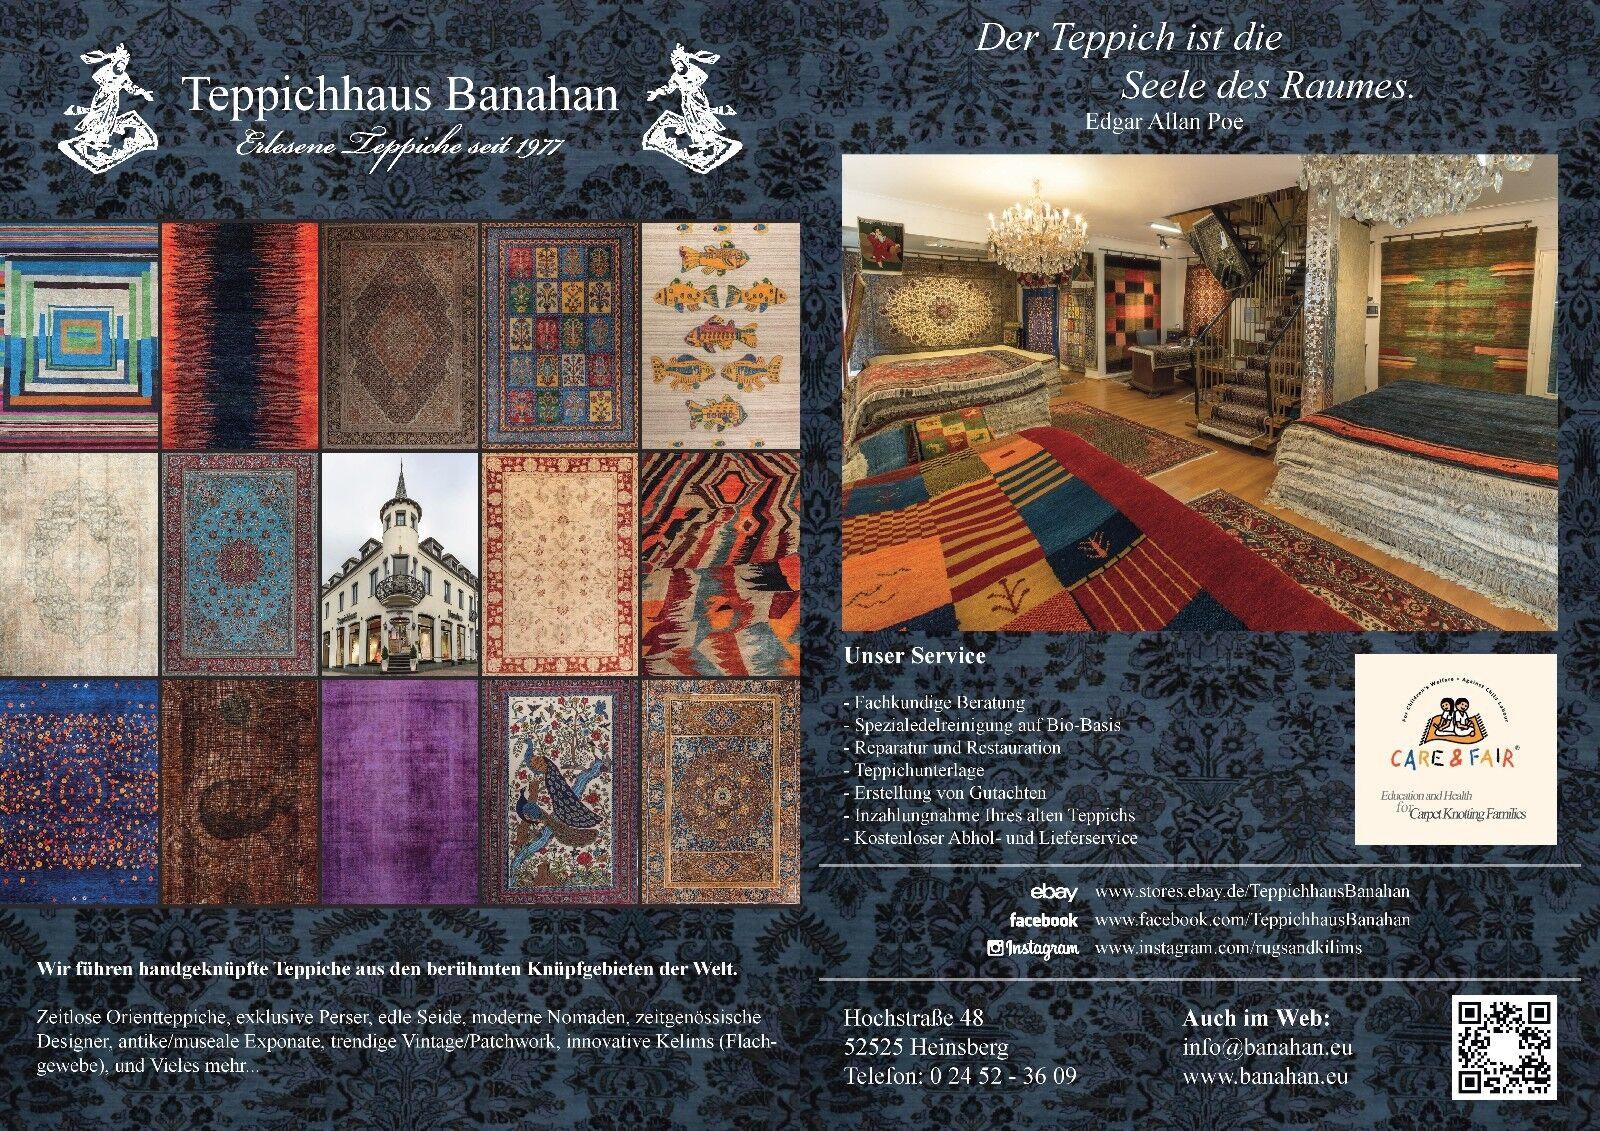 Nain Teppich Orientteppich Orientteppich Orientteppich Rug Carpet Tapis Tapijt Tappeto Alfombra Art Kunst 09ea5b